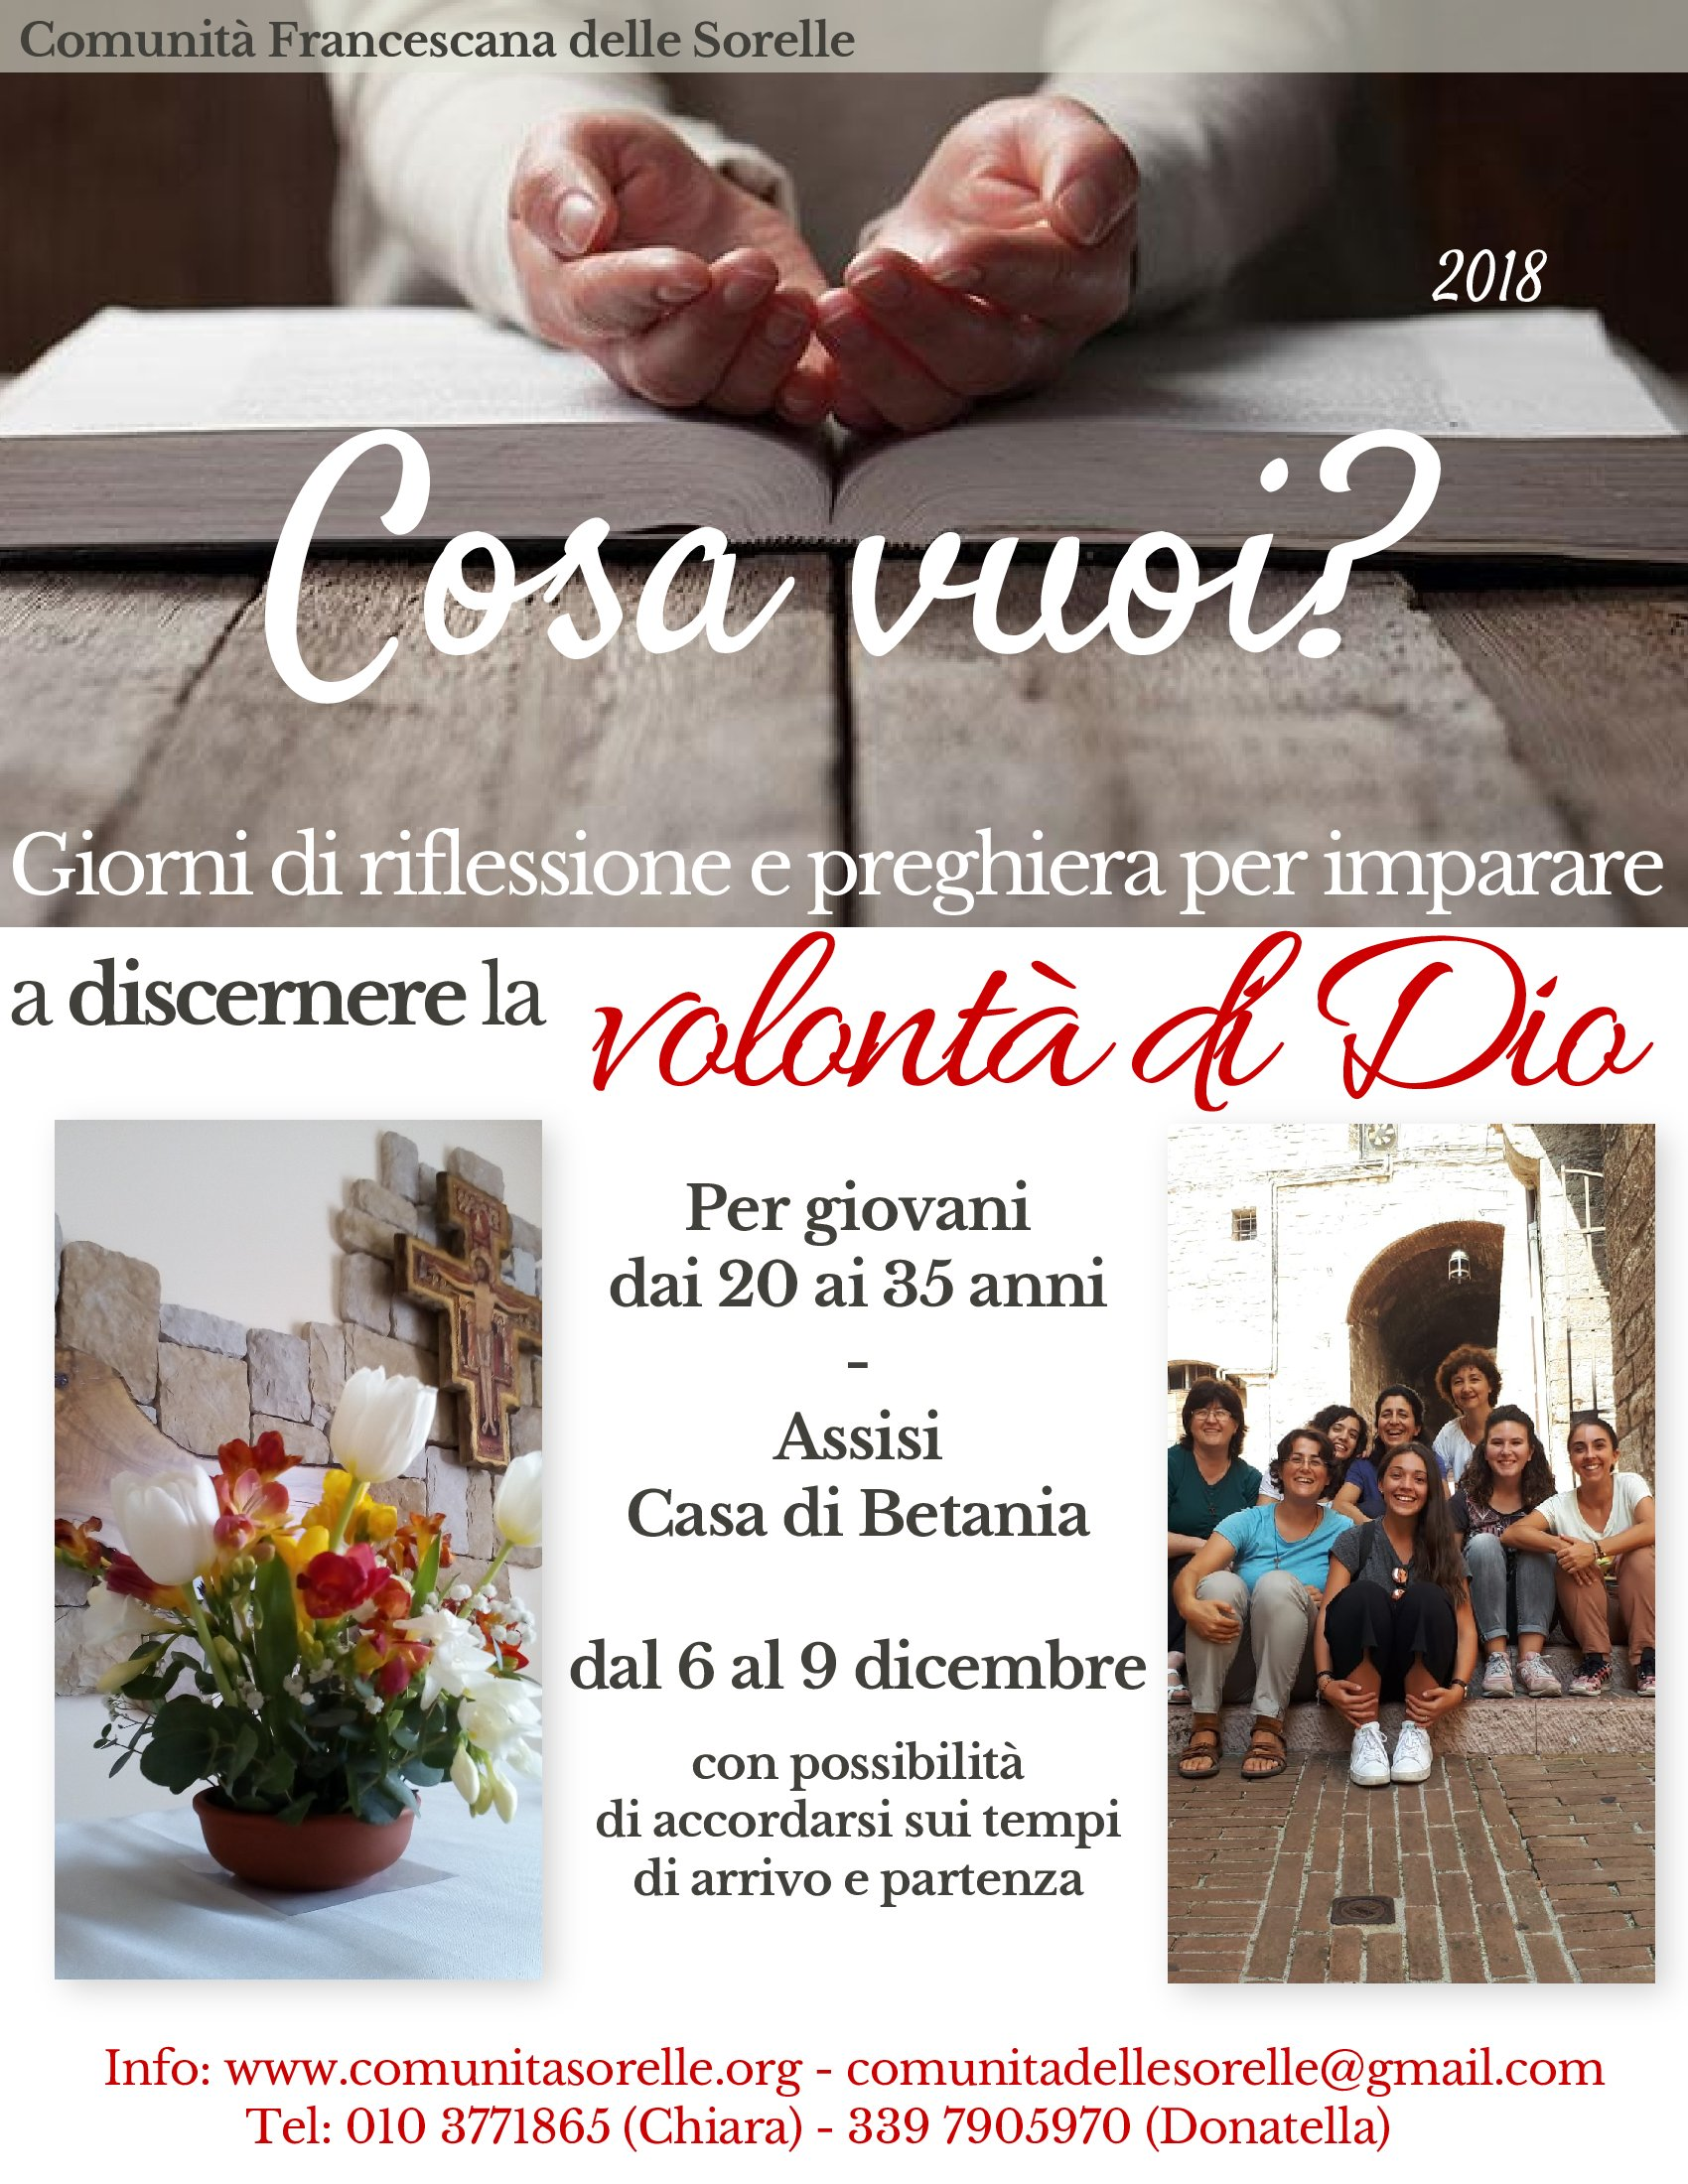 Assisi 6-9 dicembre 2018